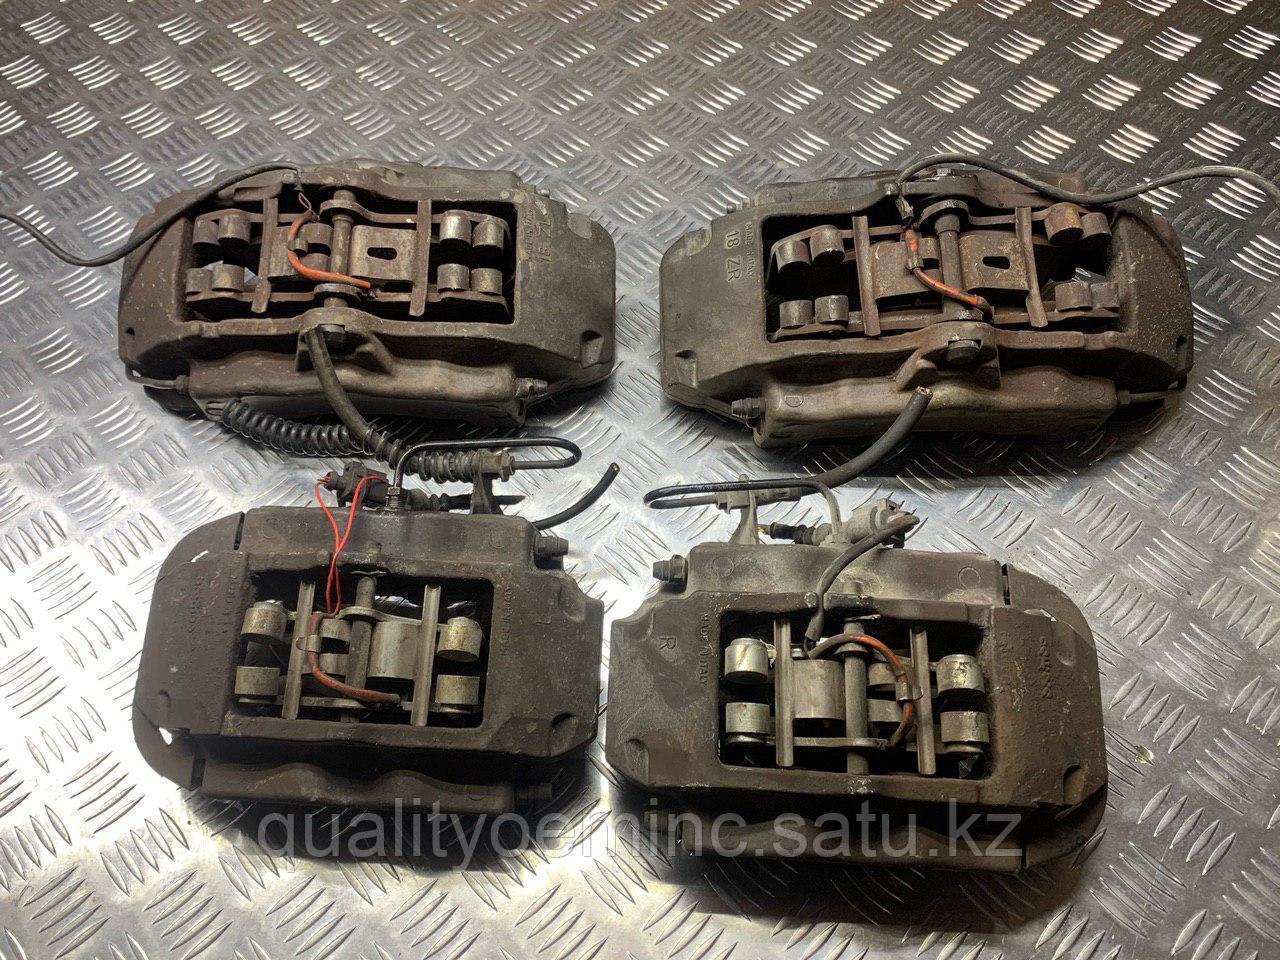 14-832 - Суппорт задний левый Audi Q7 (4L)